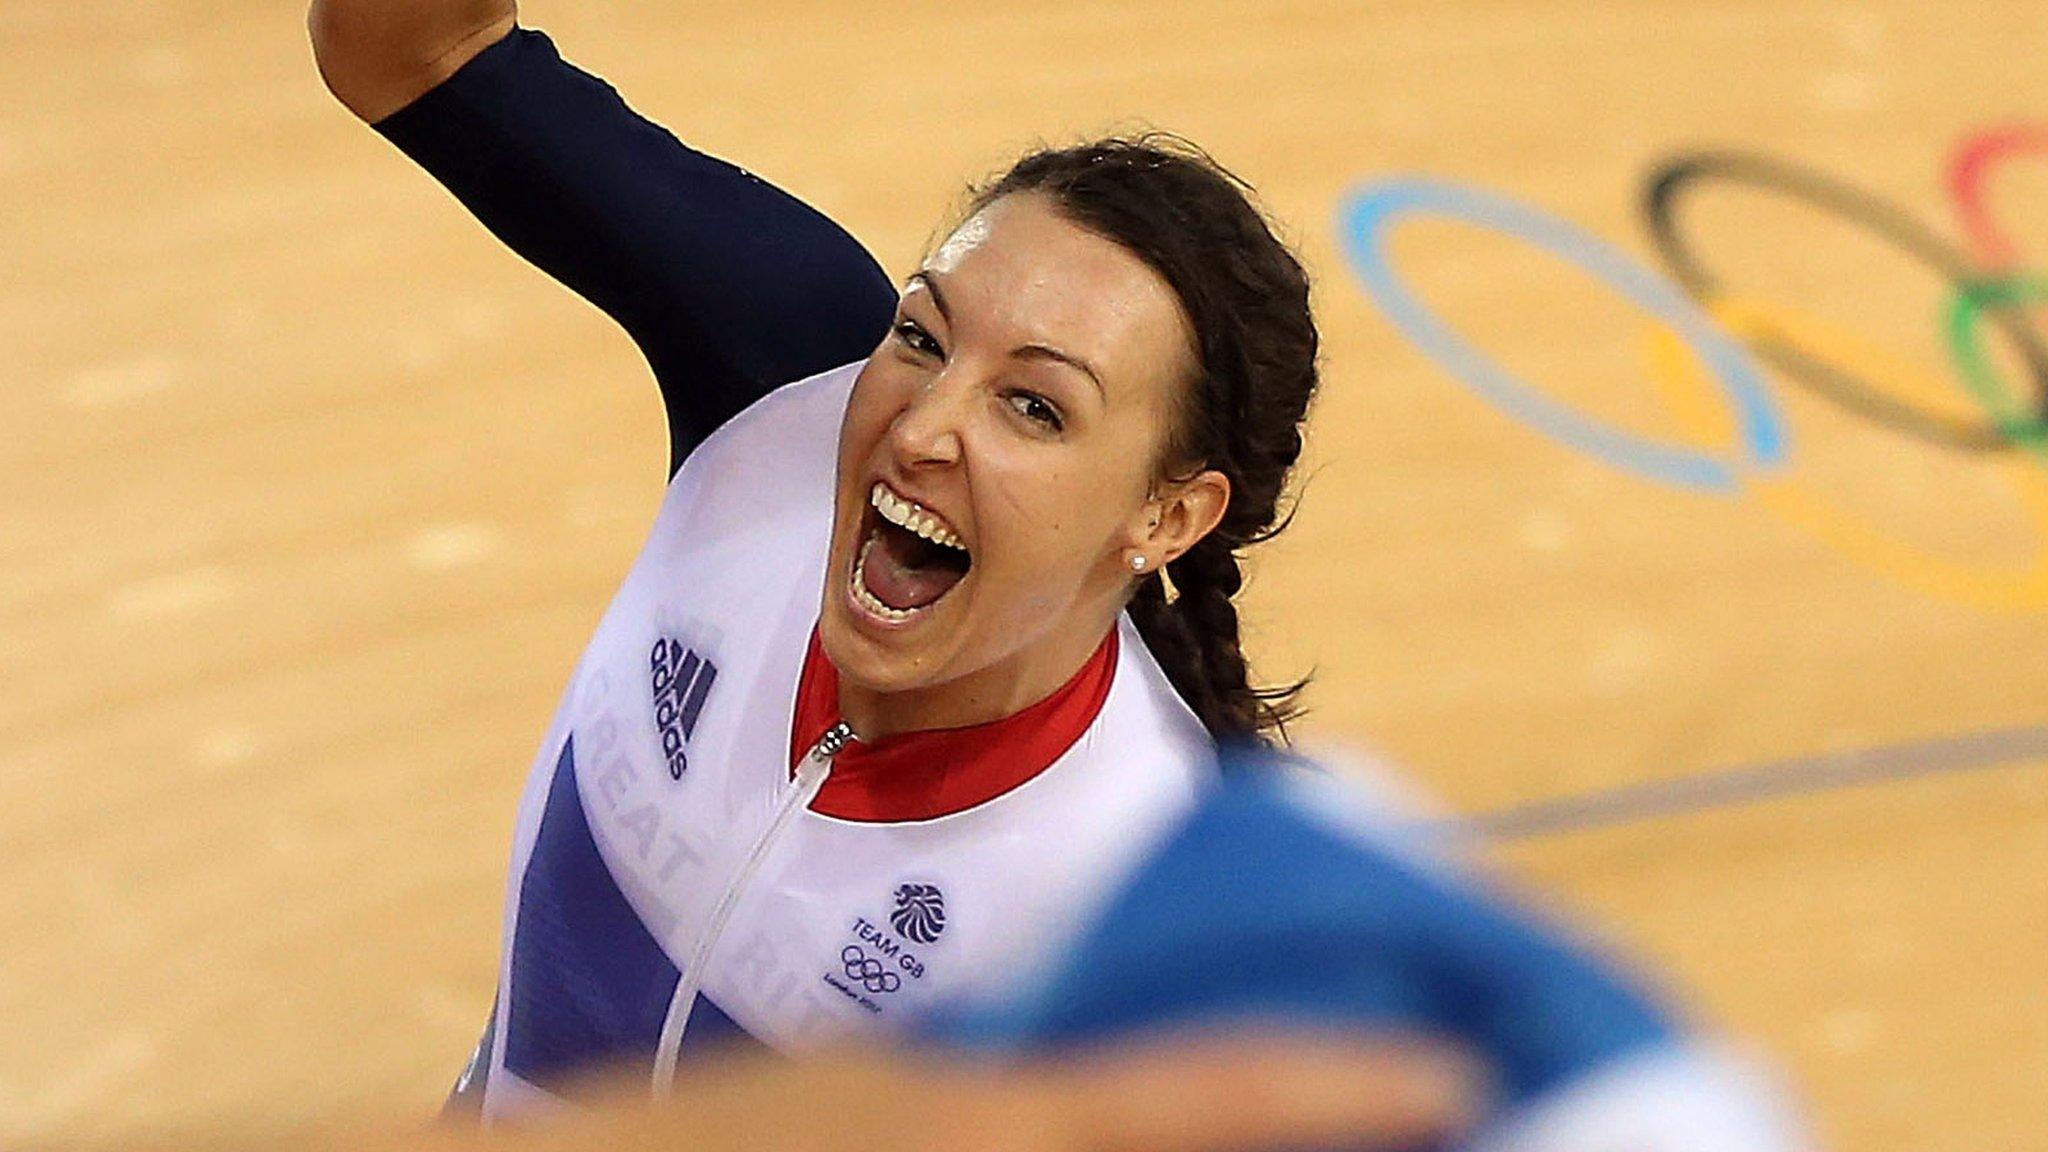 London 2012 gold medallist Rowe retires